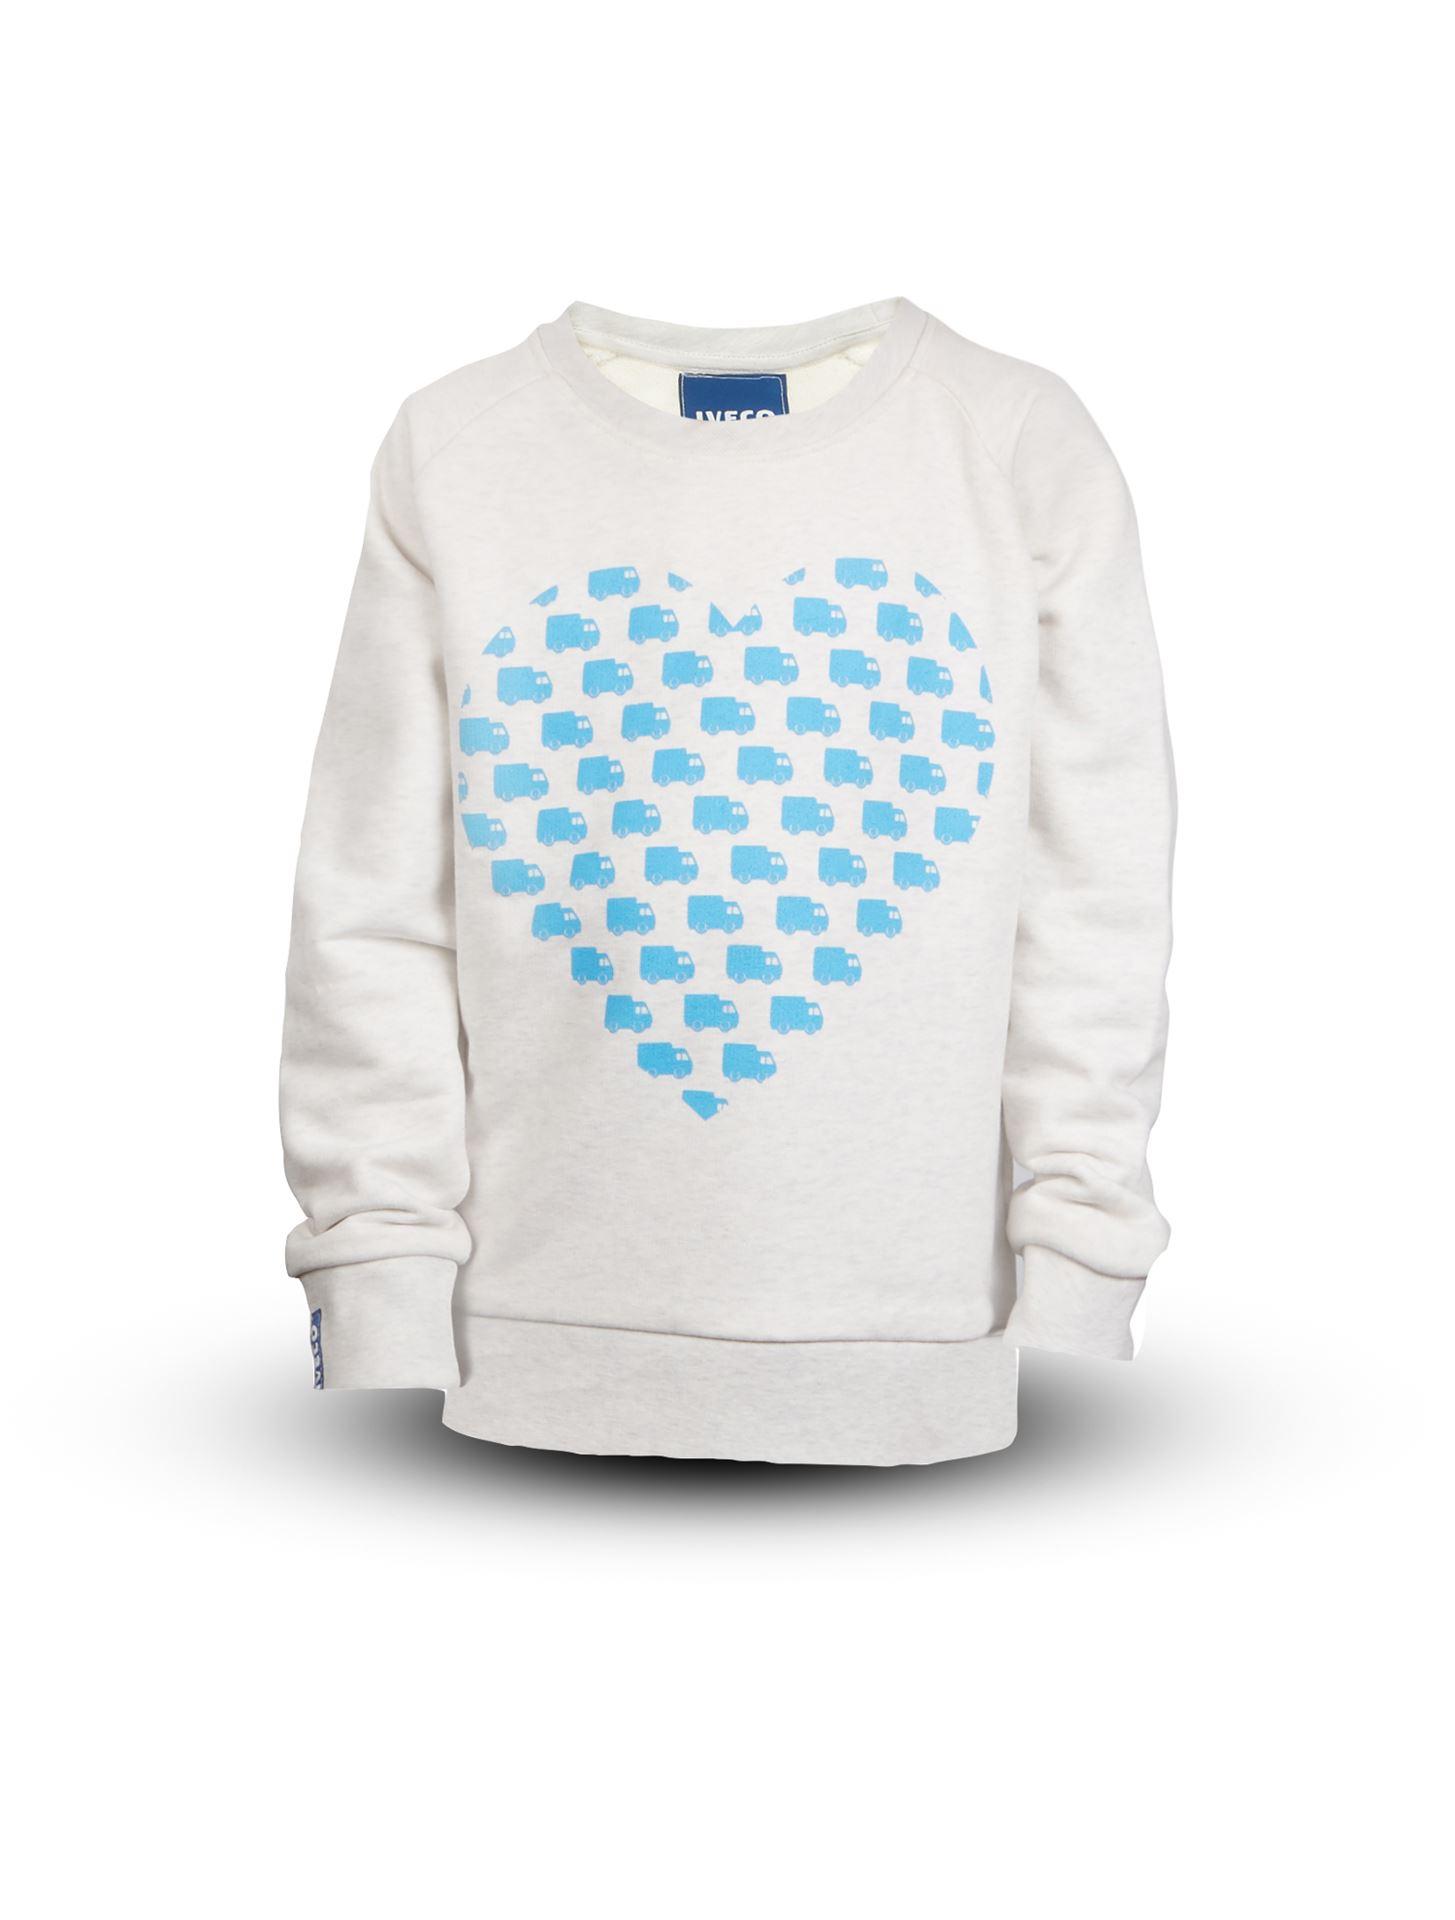 09426617b Iveco Fanshop. GIRL'S HEART SWEATSHIRT